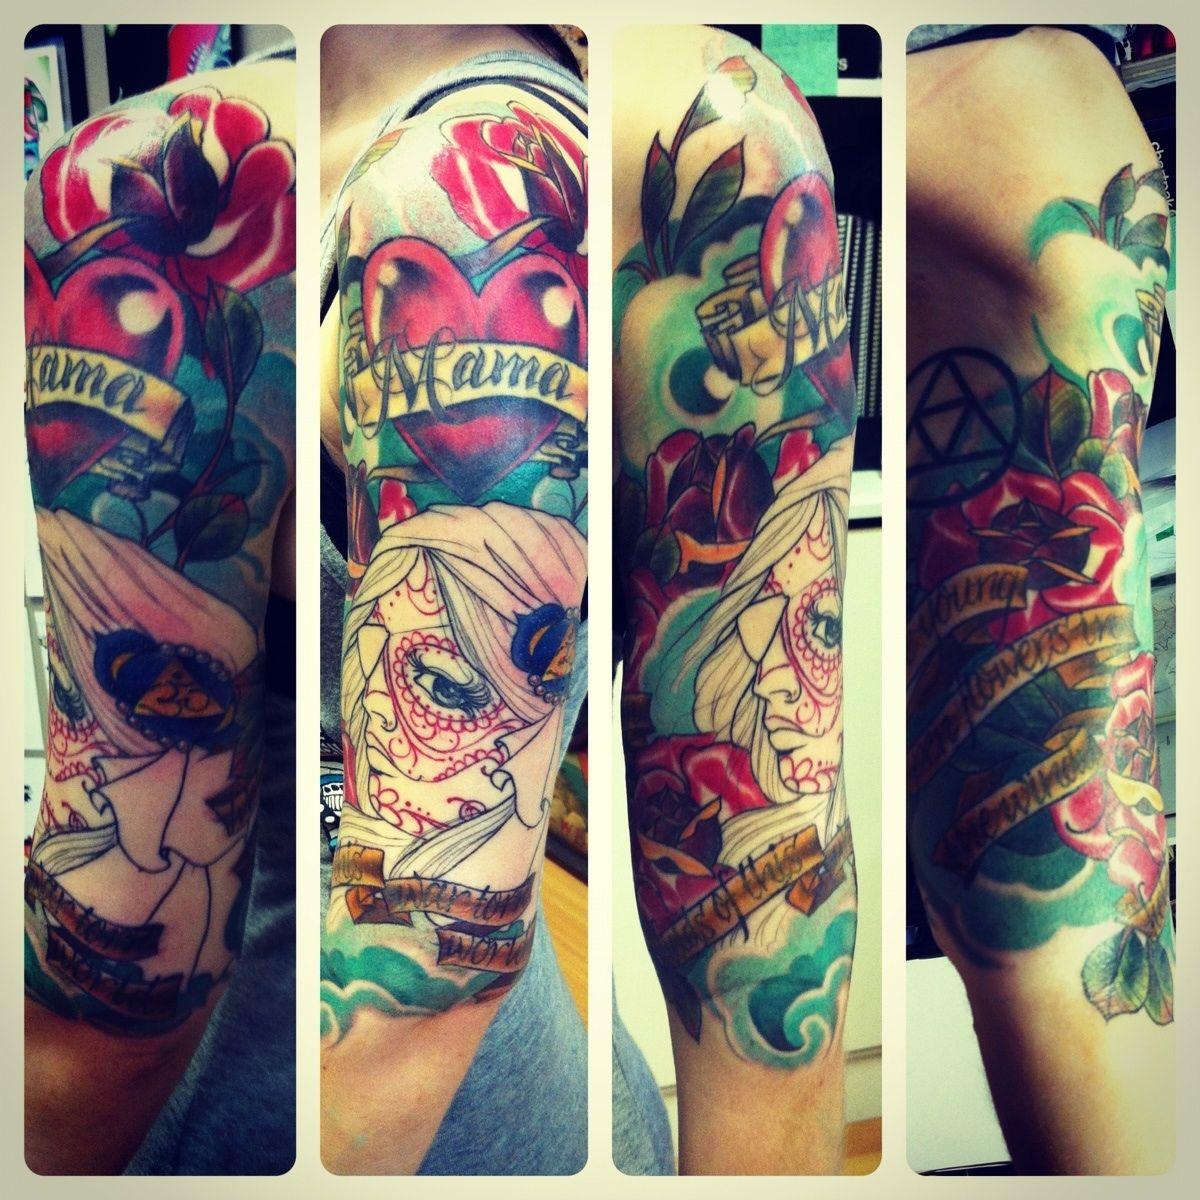 unfinished gypsy tattoo found on reddit | Tattoos, Body ...